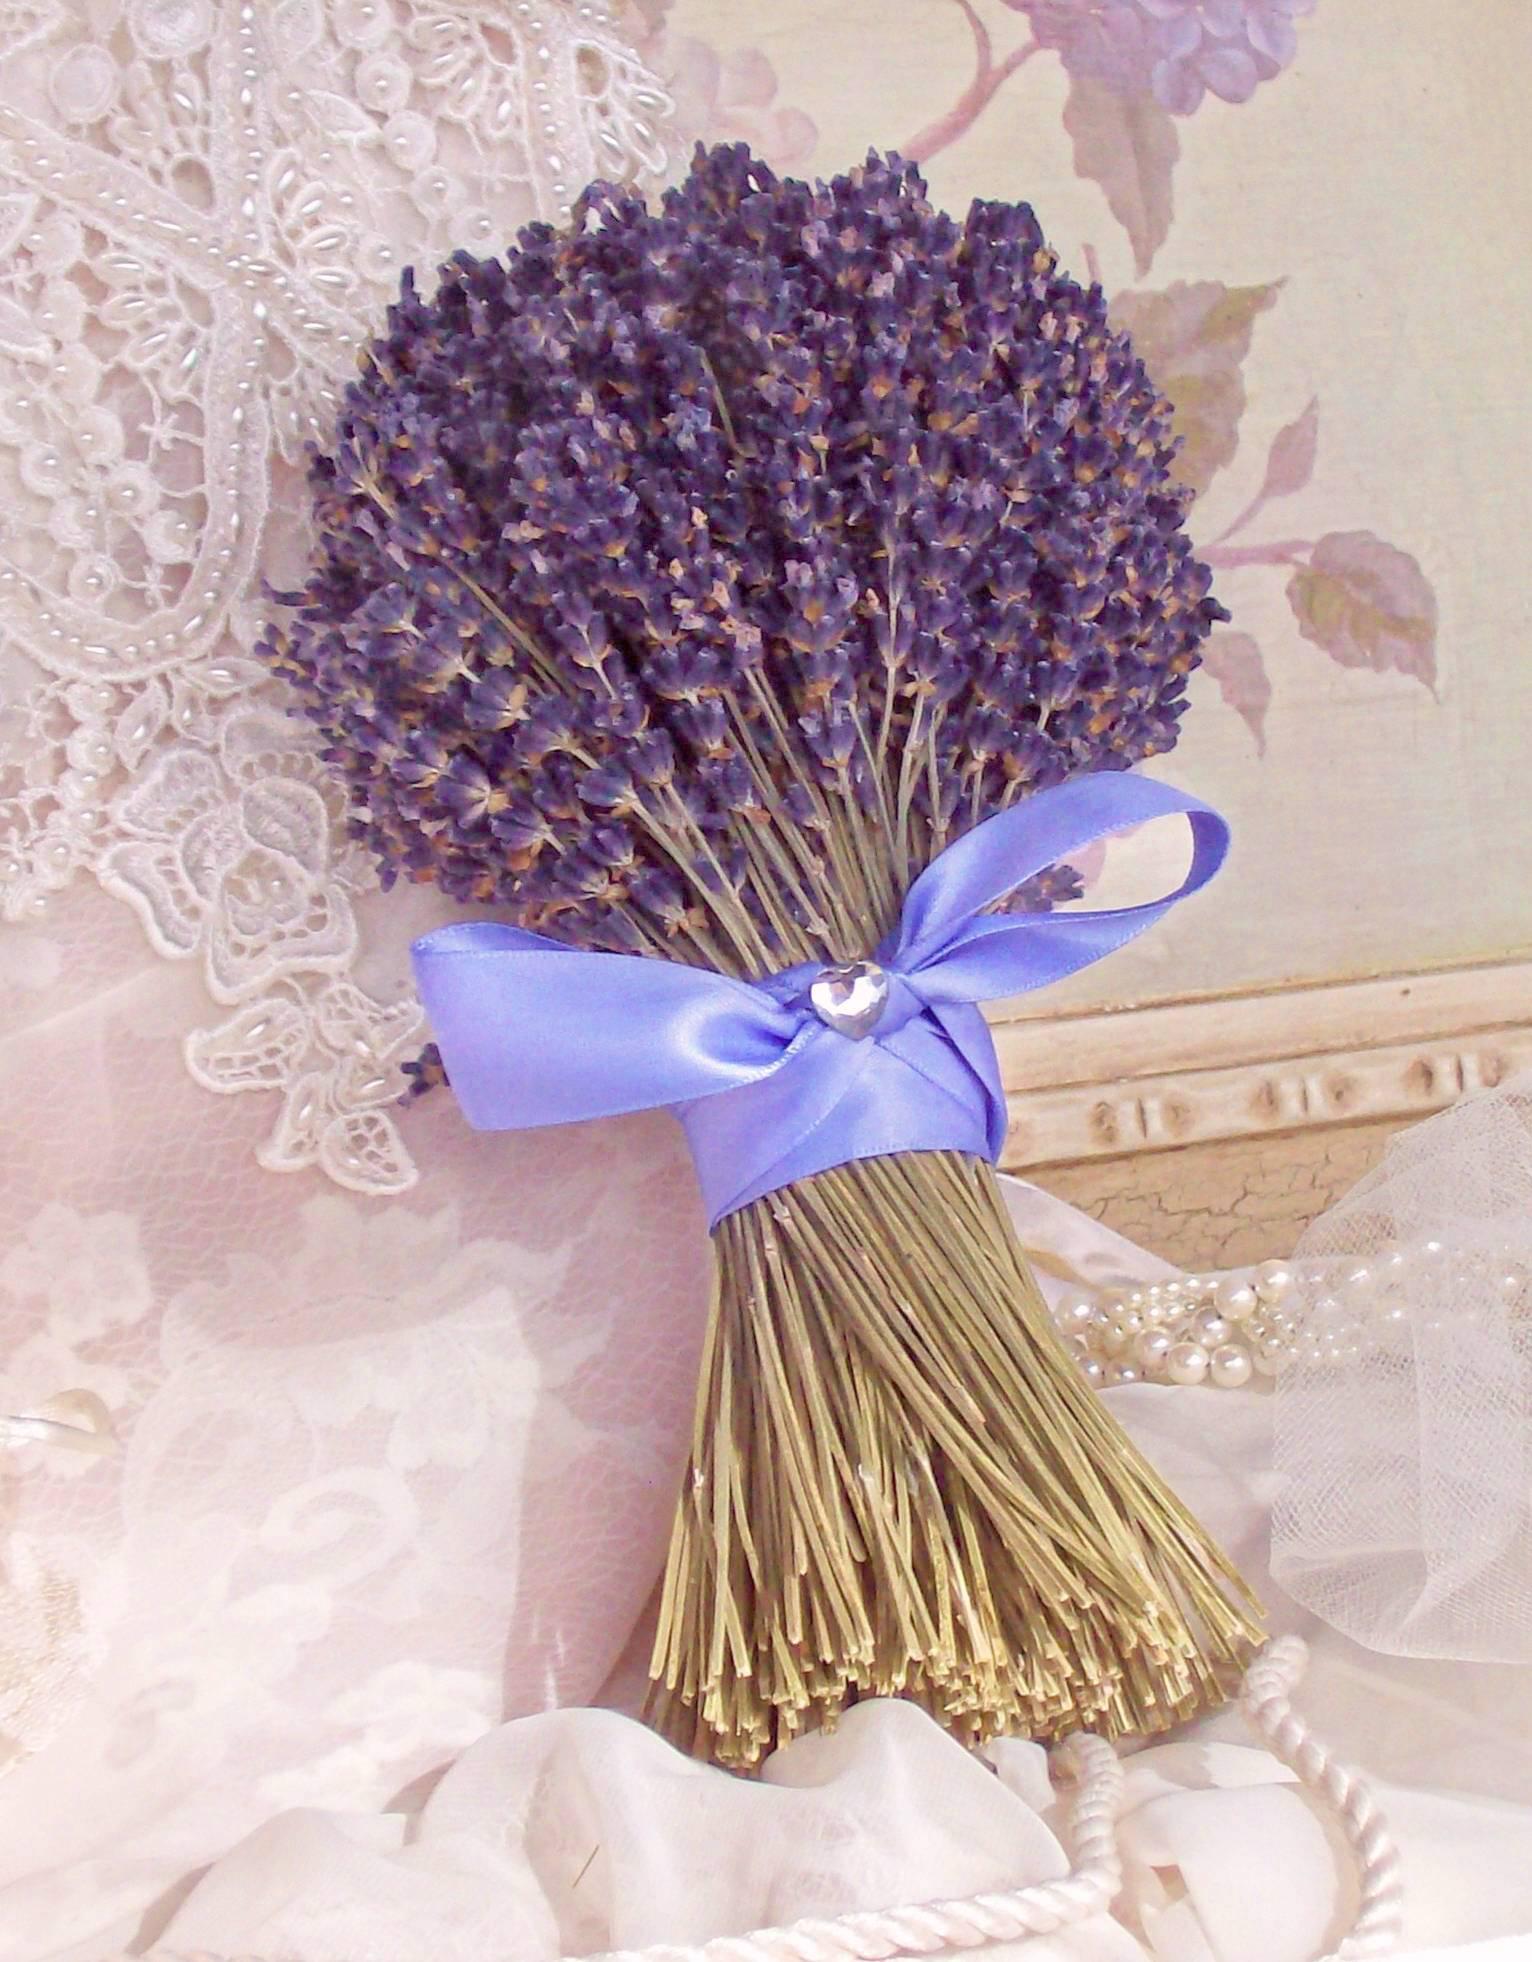 Levendula csokor.jpg